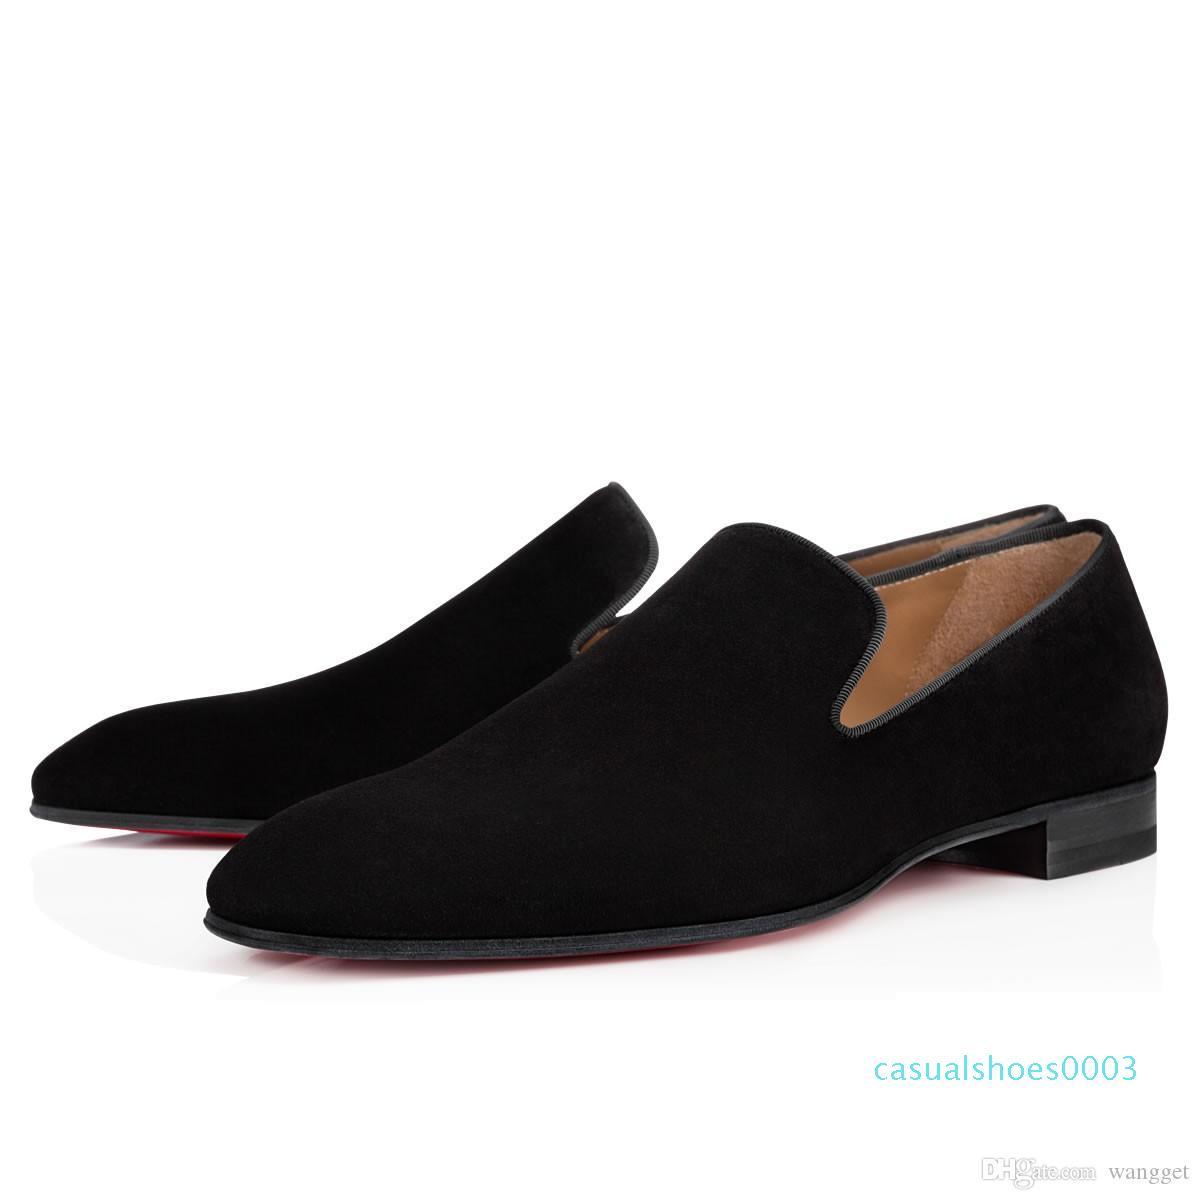 Marque Red Bottom Mocassins Luxury Party Chaussures de mariage Designer cuir verni noir Chaussures Robe Suede pour Slip Mens Flats C03